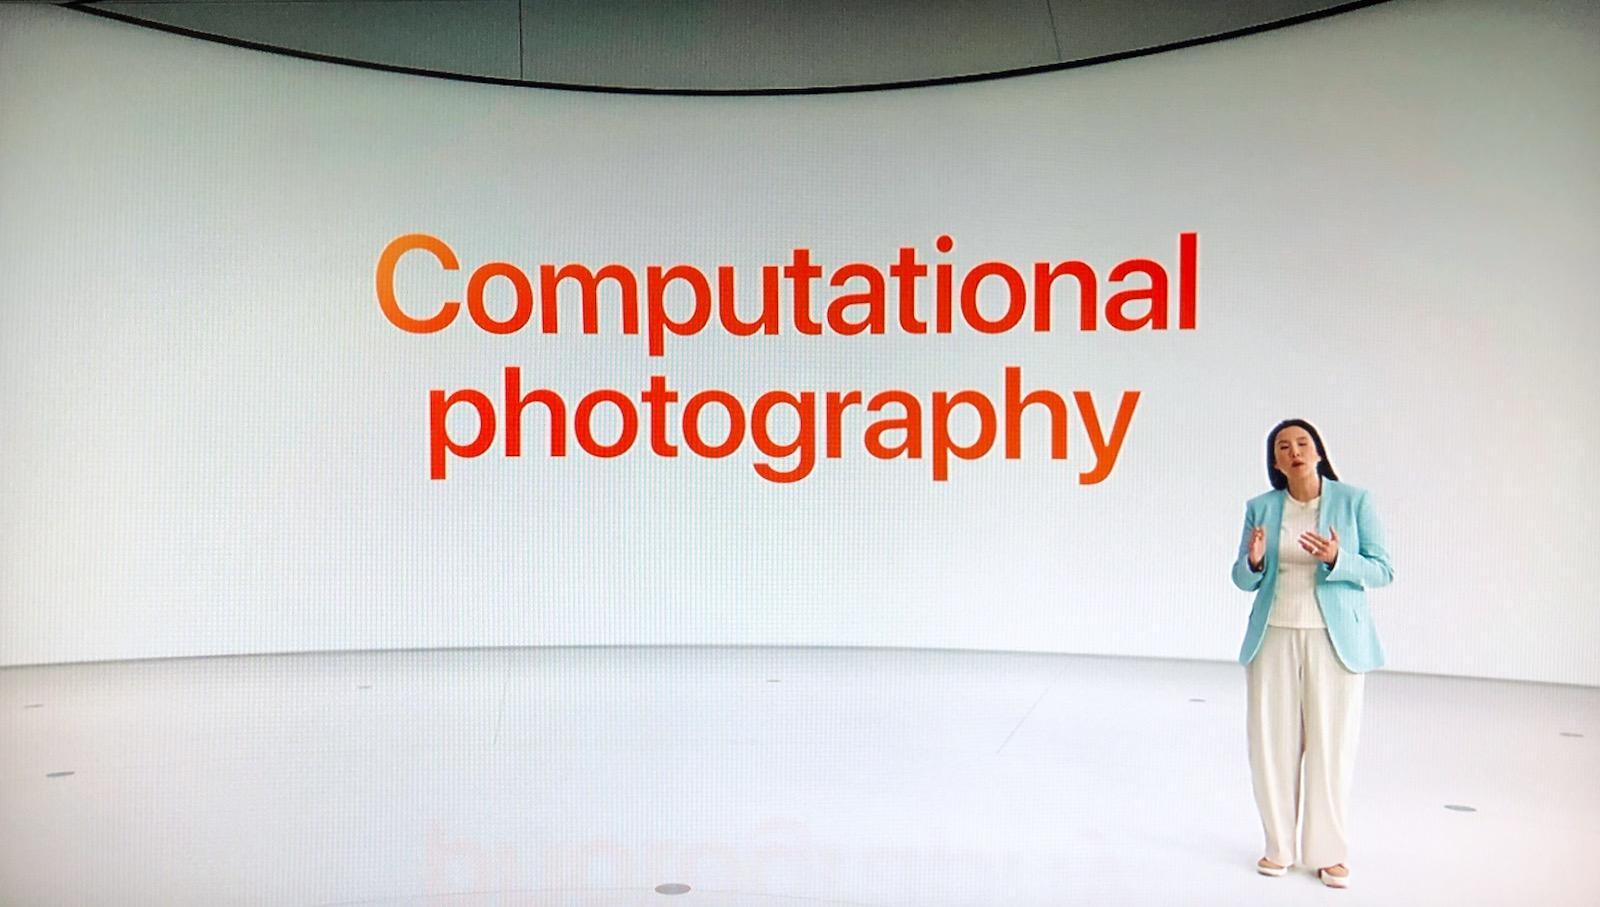 https://thedigitalstory.com/2020/10/20/computational-photography.jpeg